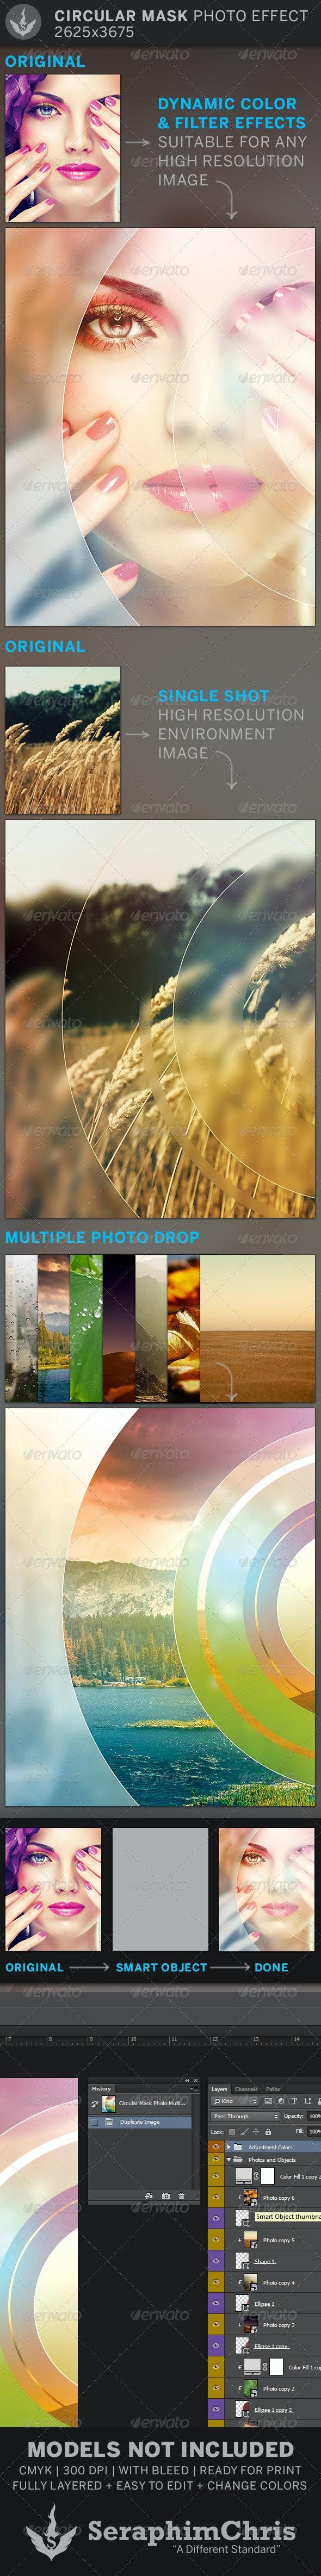 Circular Mask Photo Effect Template - Artistic Photo Templates